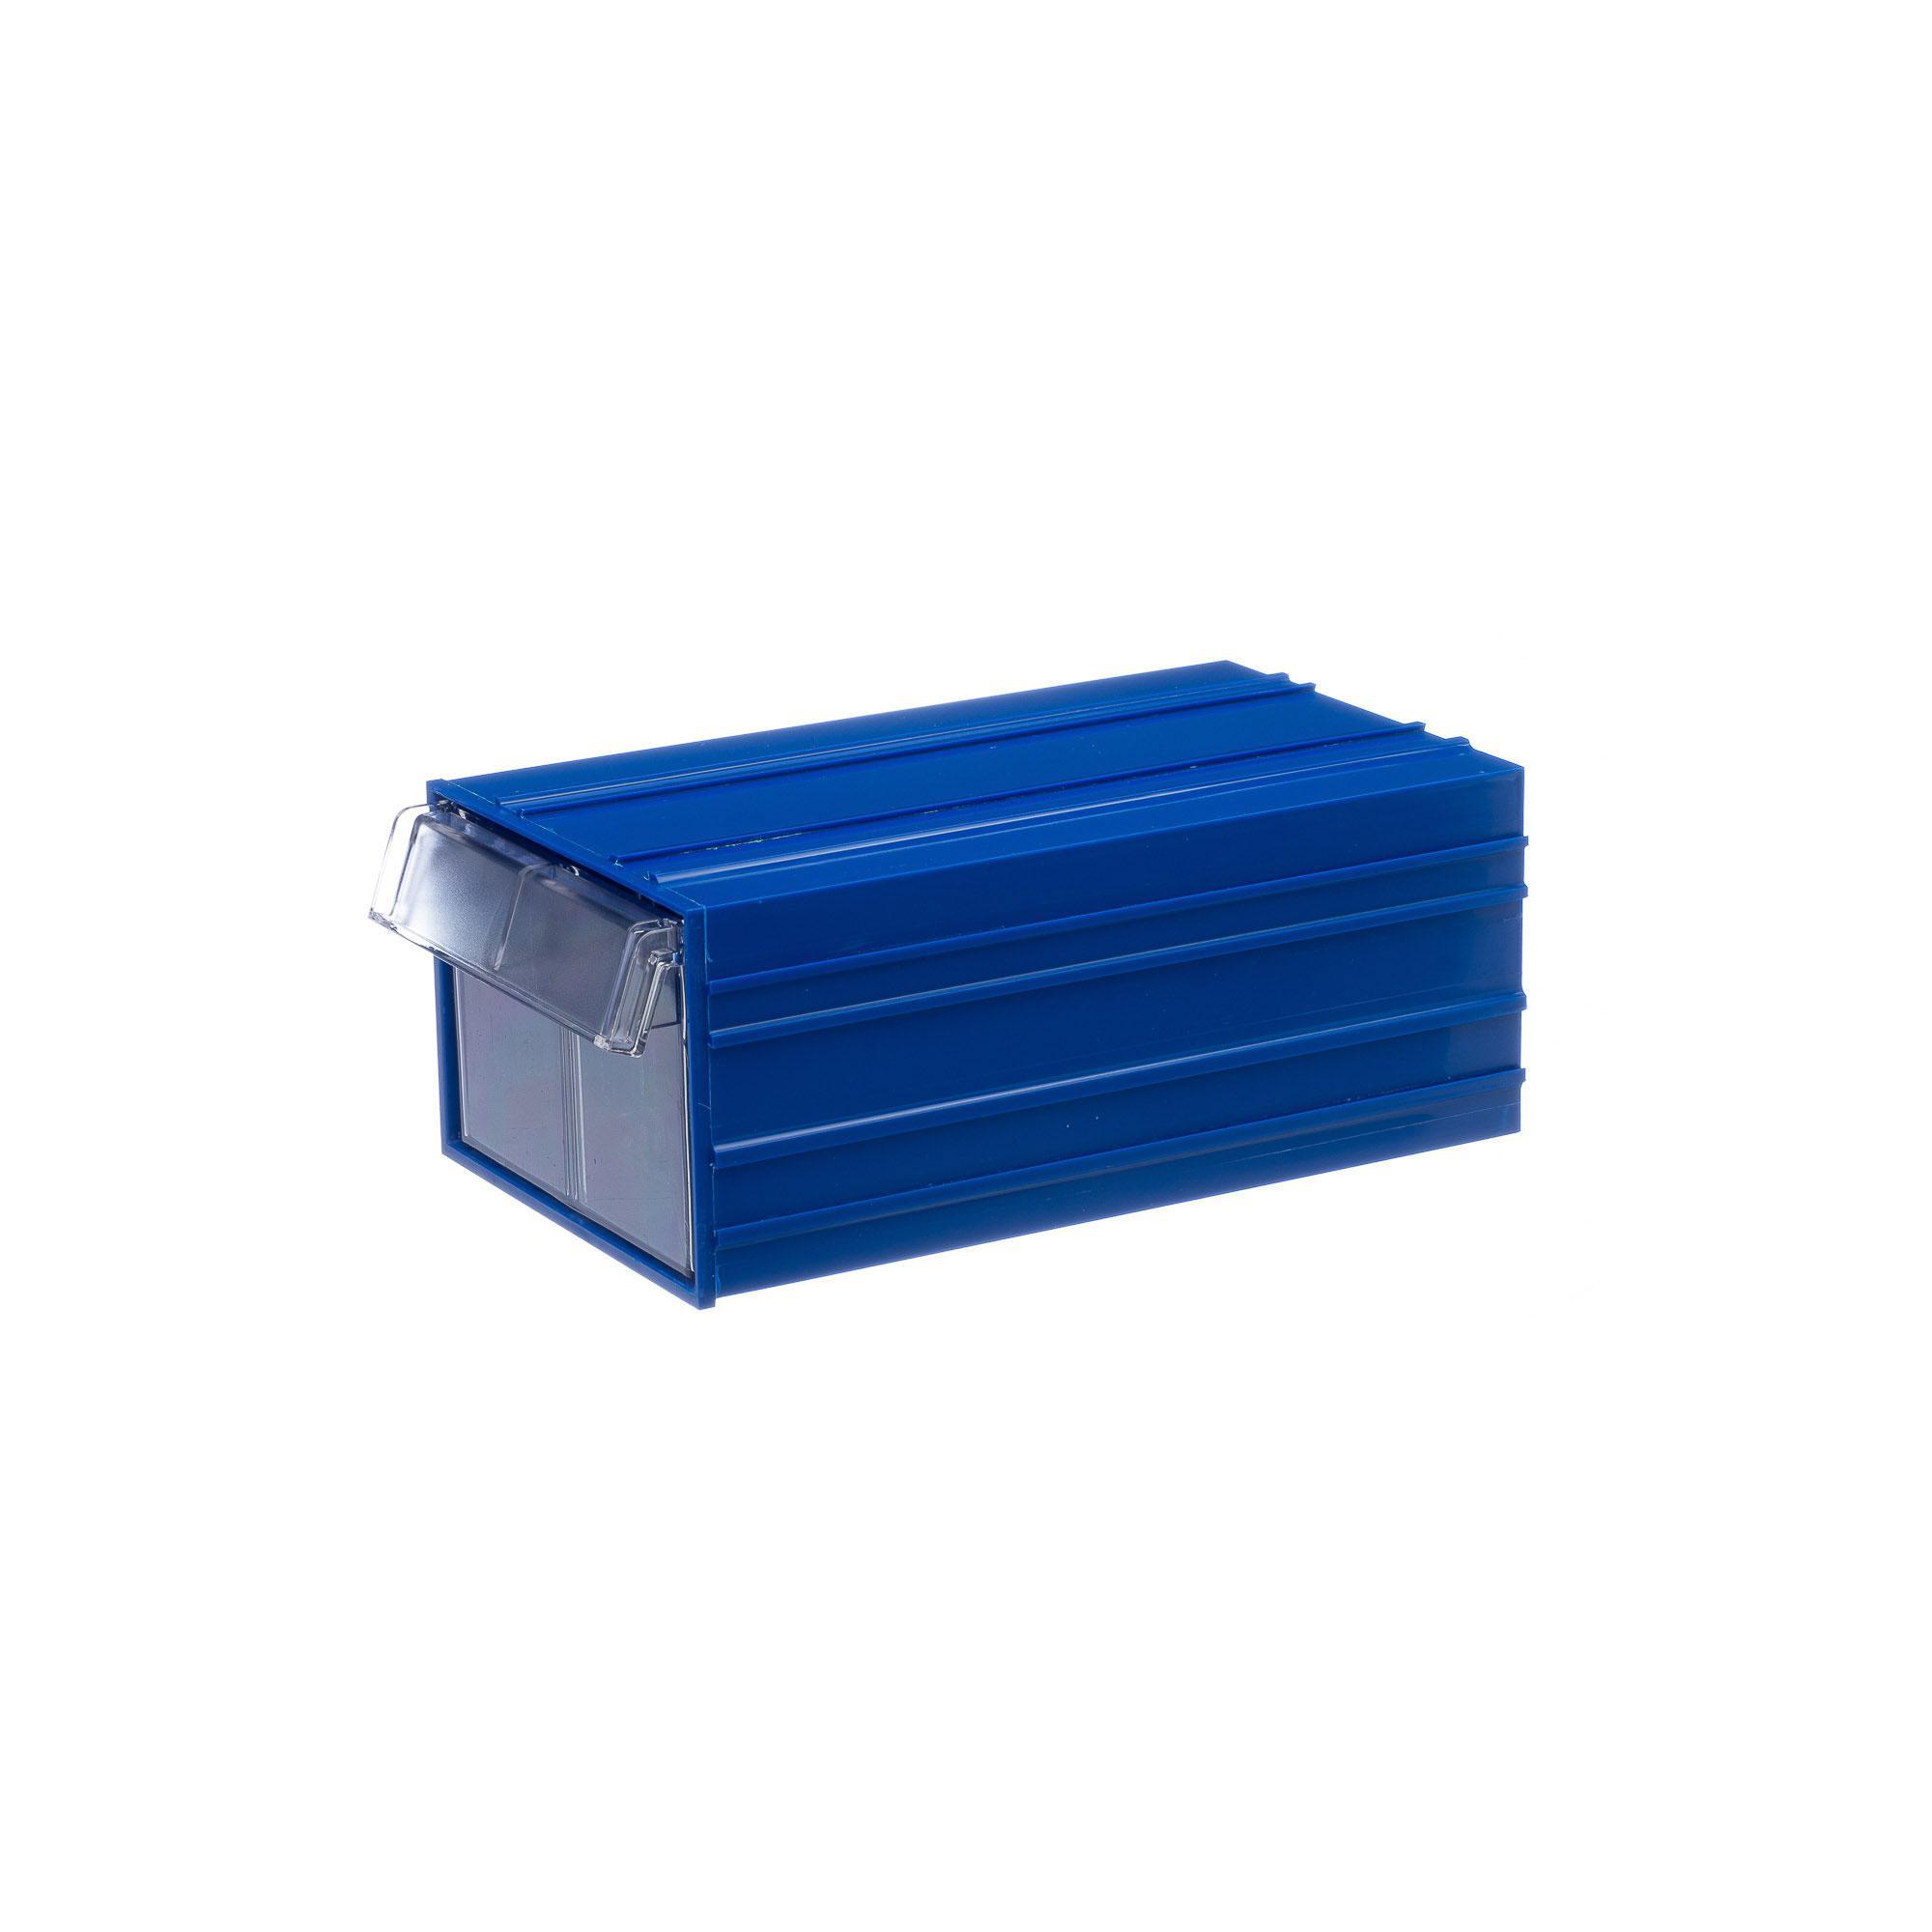 Короб СТЕЛЛА С-2 синий/ прозрачный